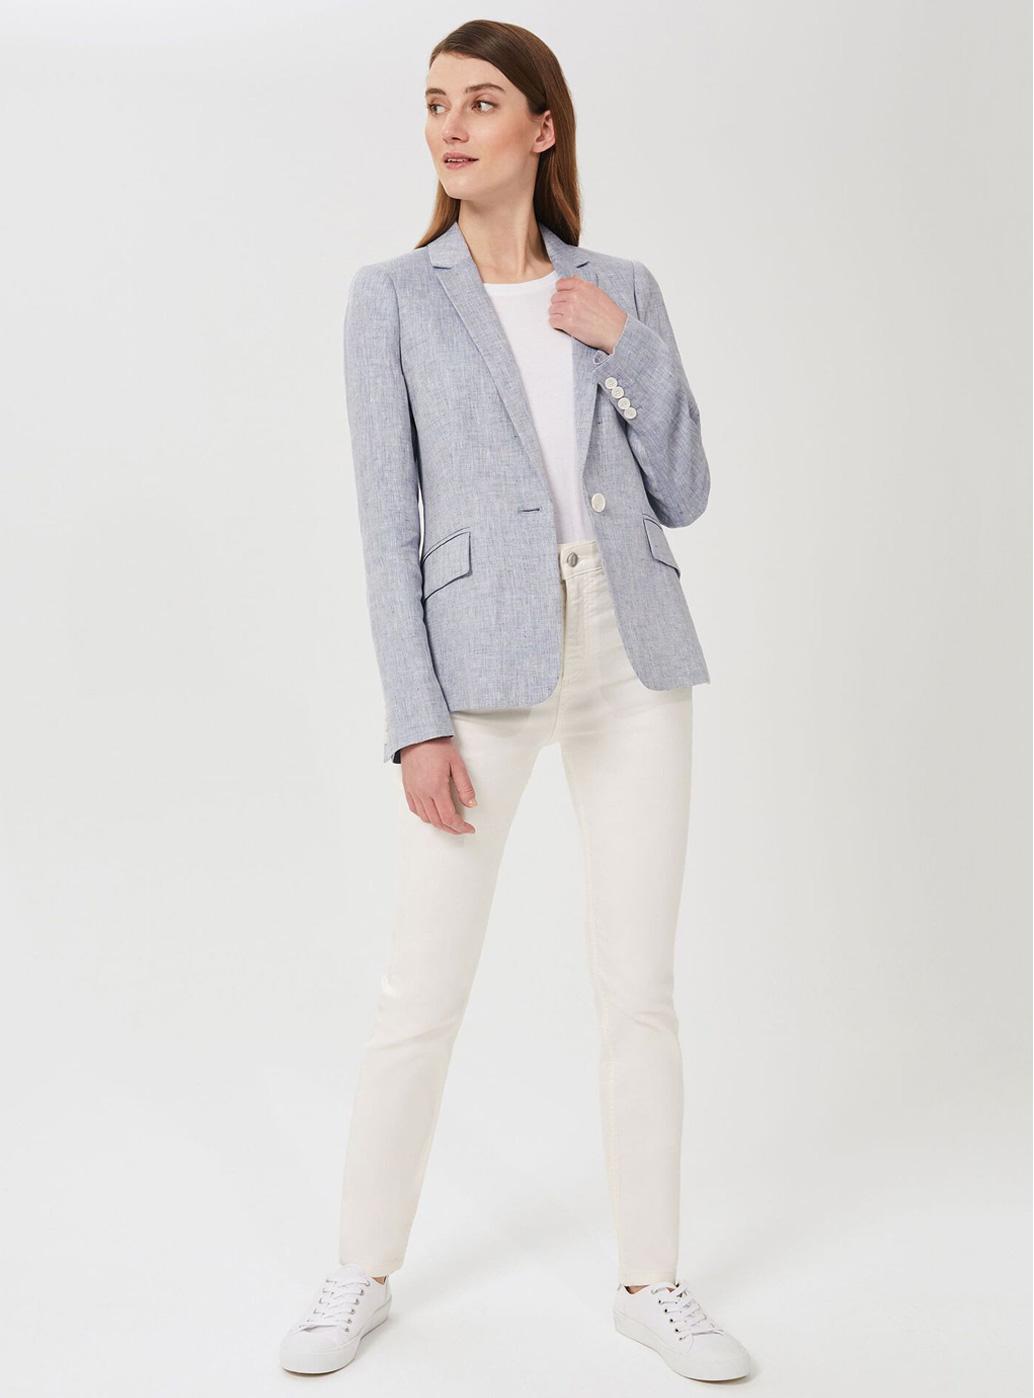 Model wears white jeans and a blue linen blazer.